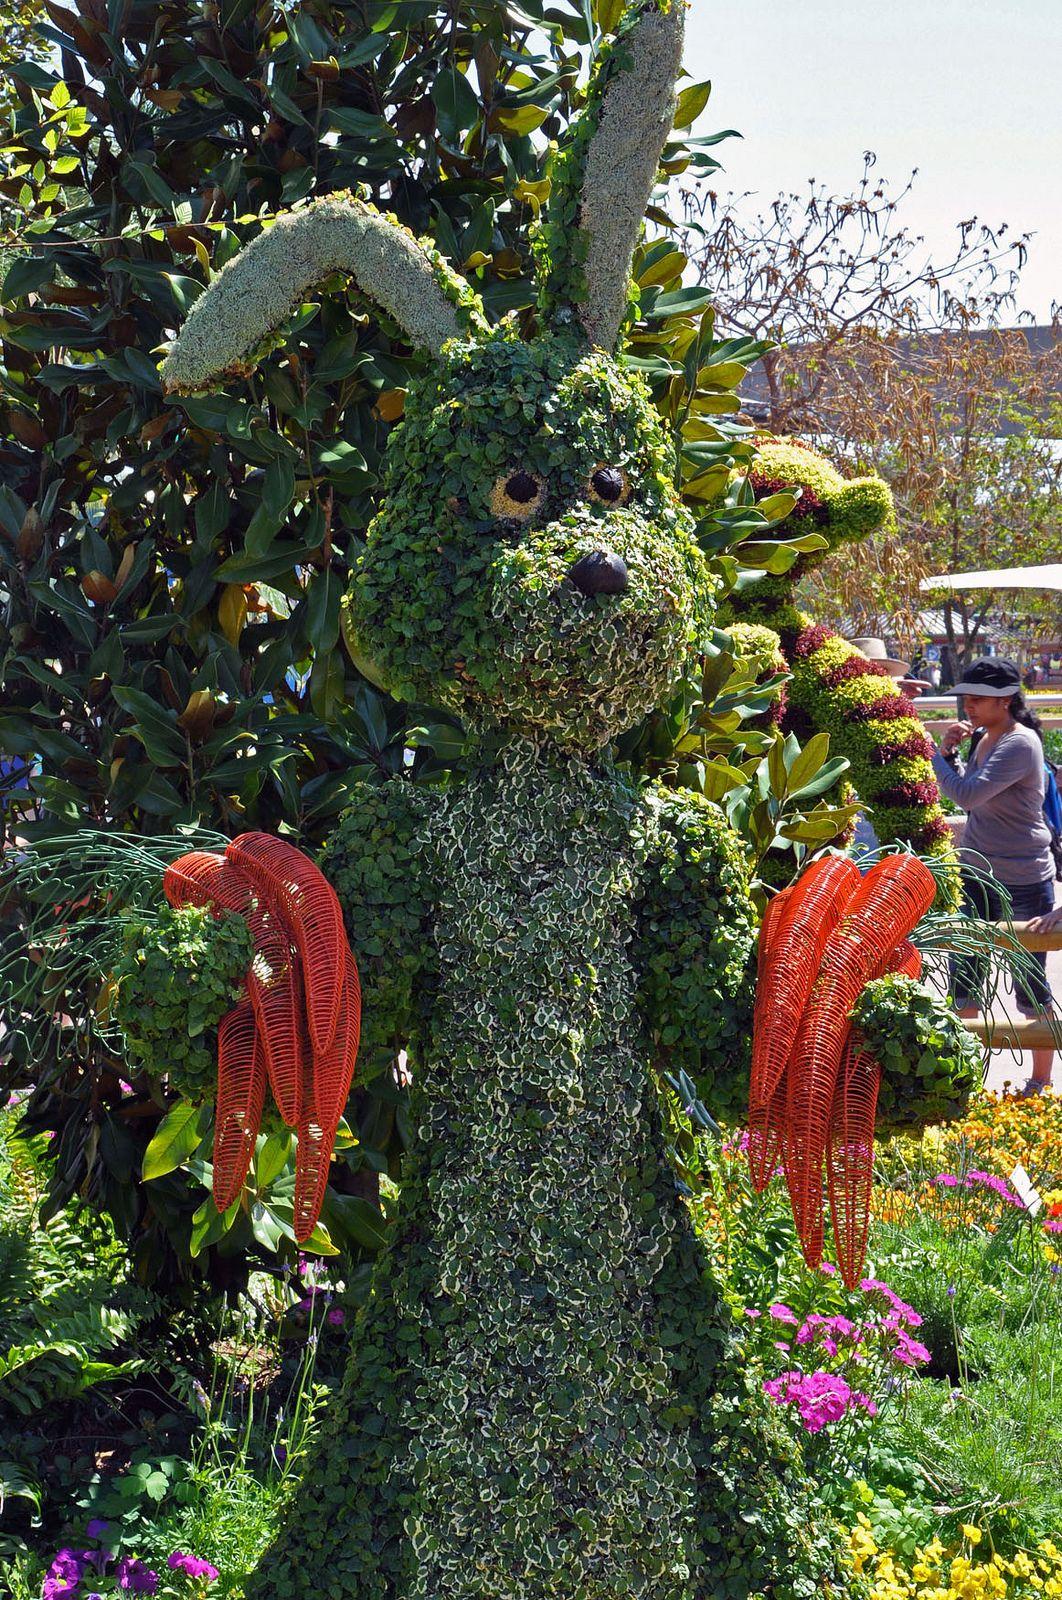 Rabbit Topiary The Epcot International Flower U0026 Garden Festival 2011 At  Walt Disney World In Florida.